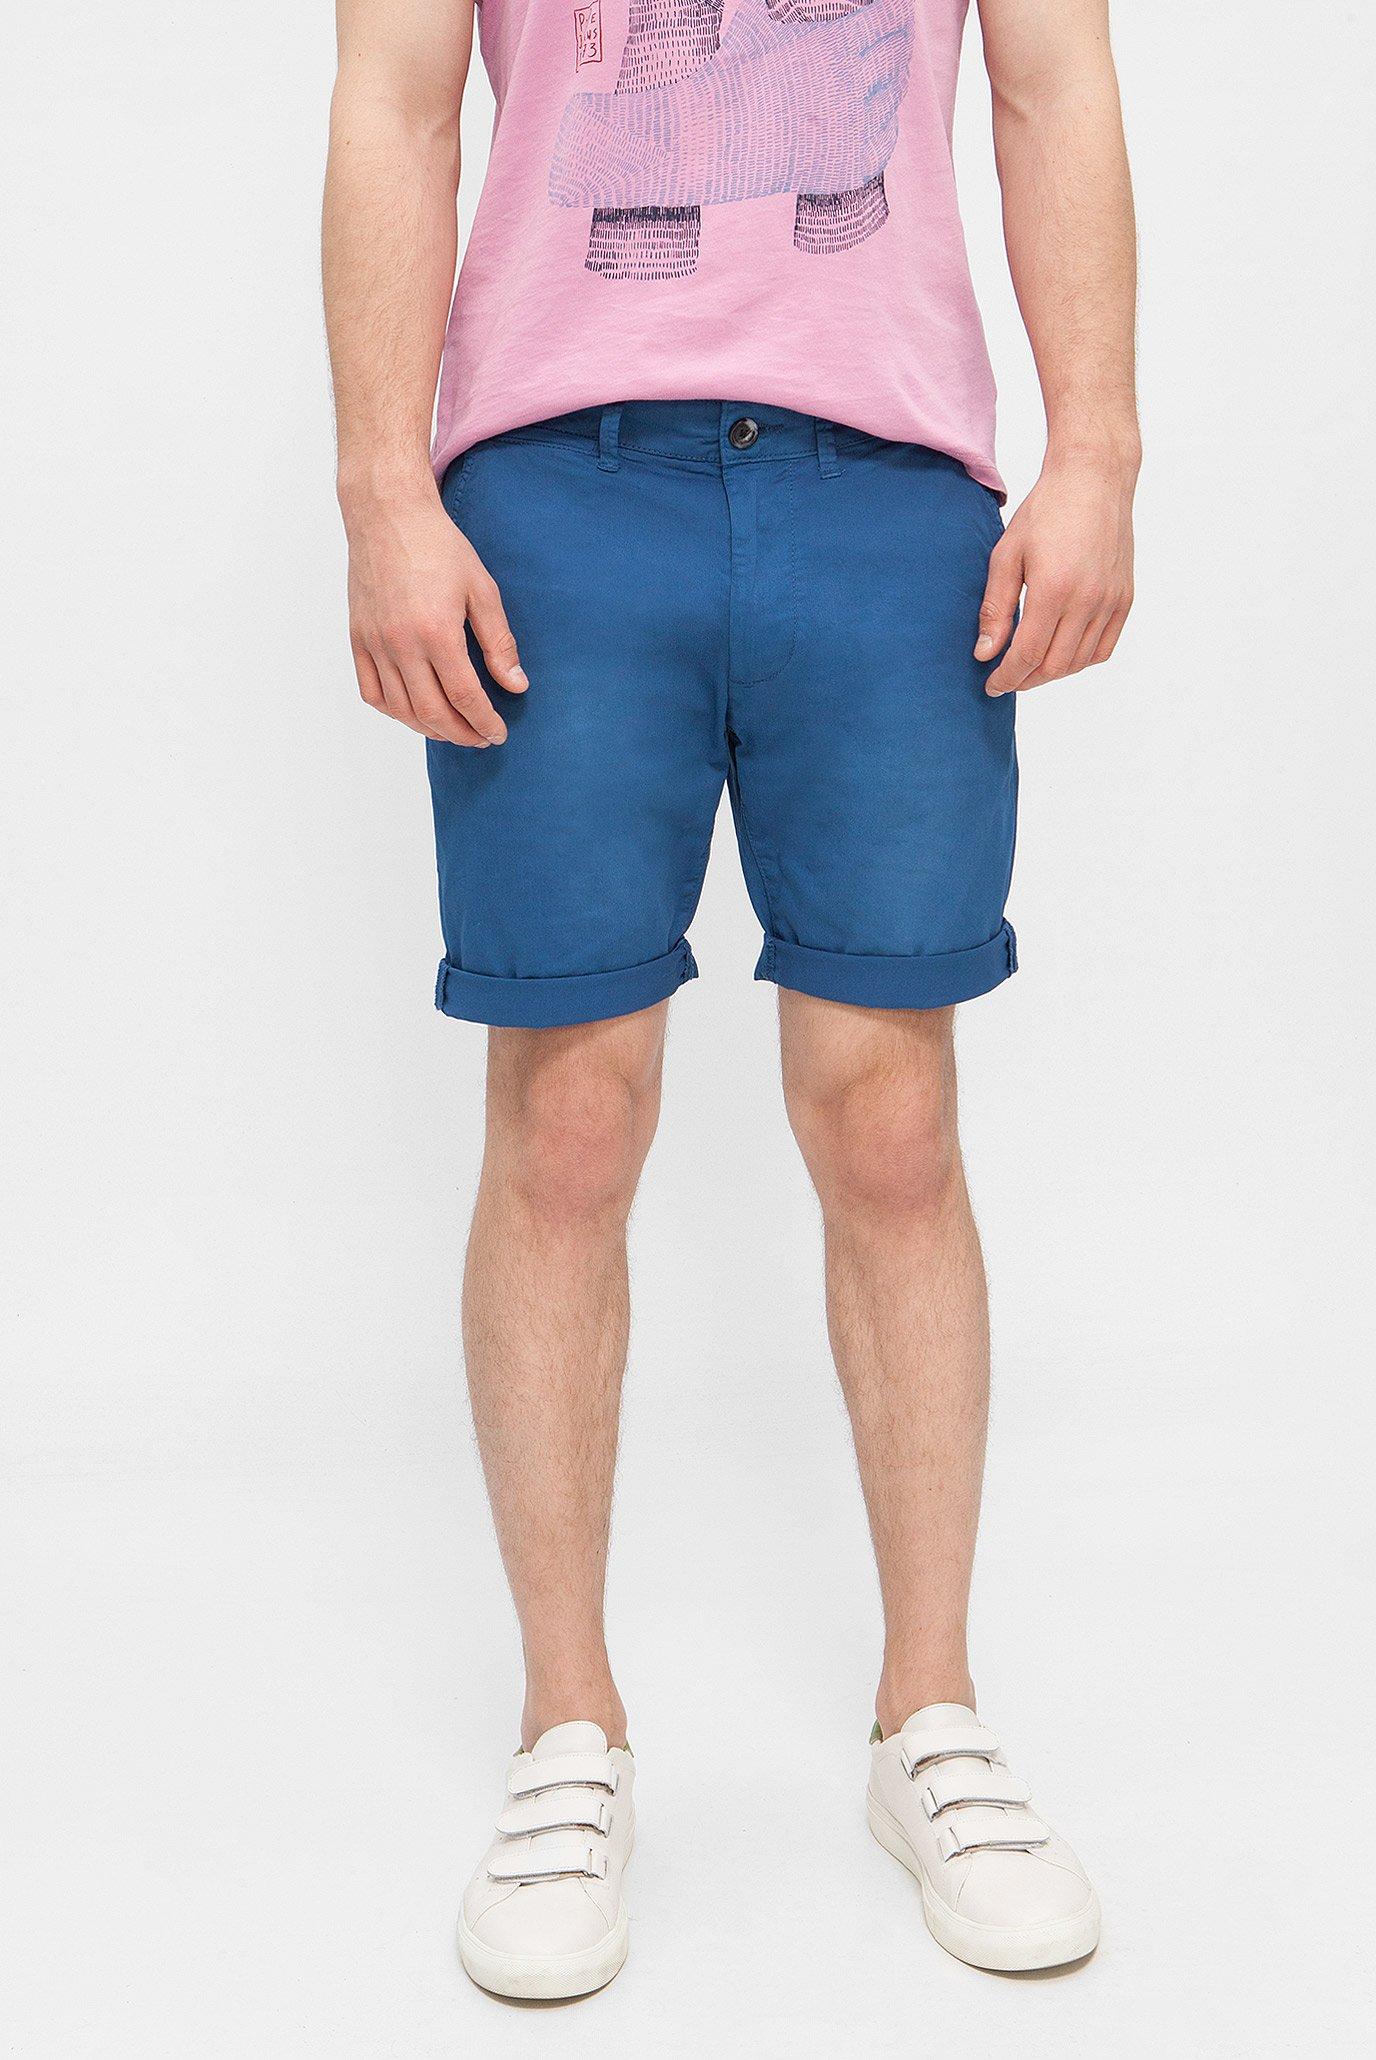 02434817c3a Купить Мужские синие шорты QUEEN SHORT Pepe Jeans Pepe Jeans PM800227C75 –  Киев